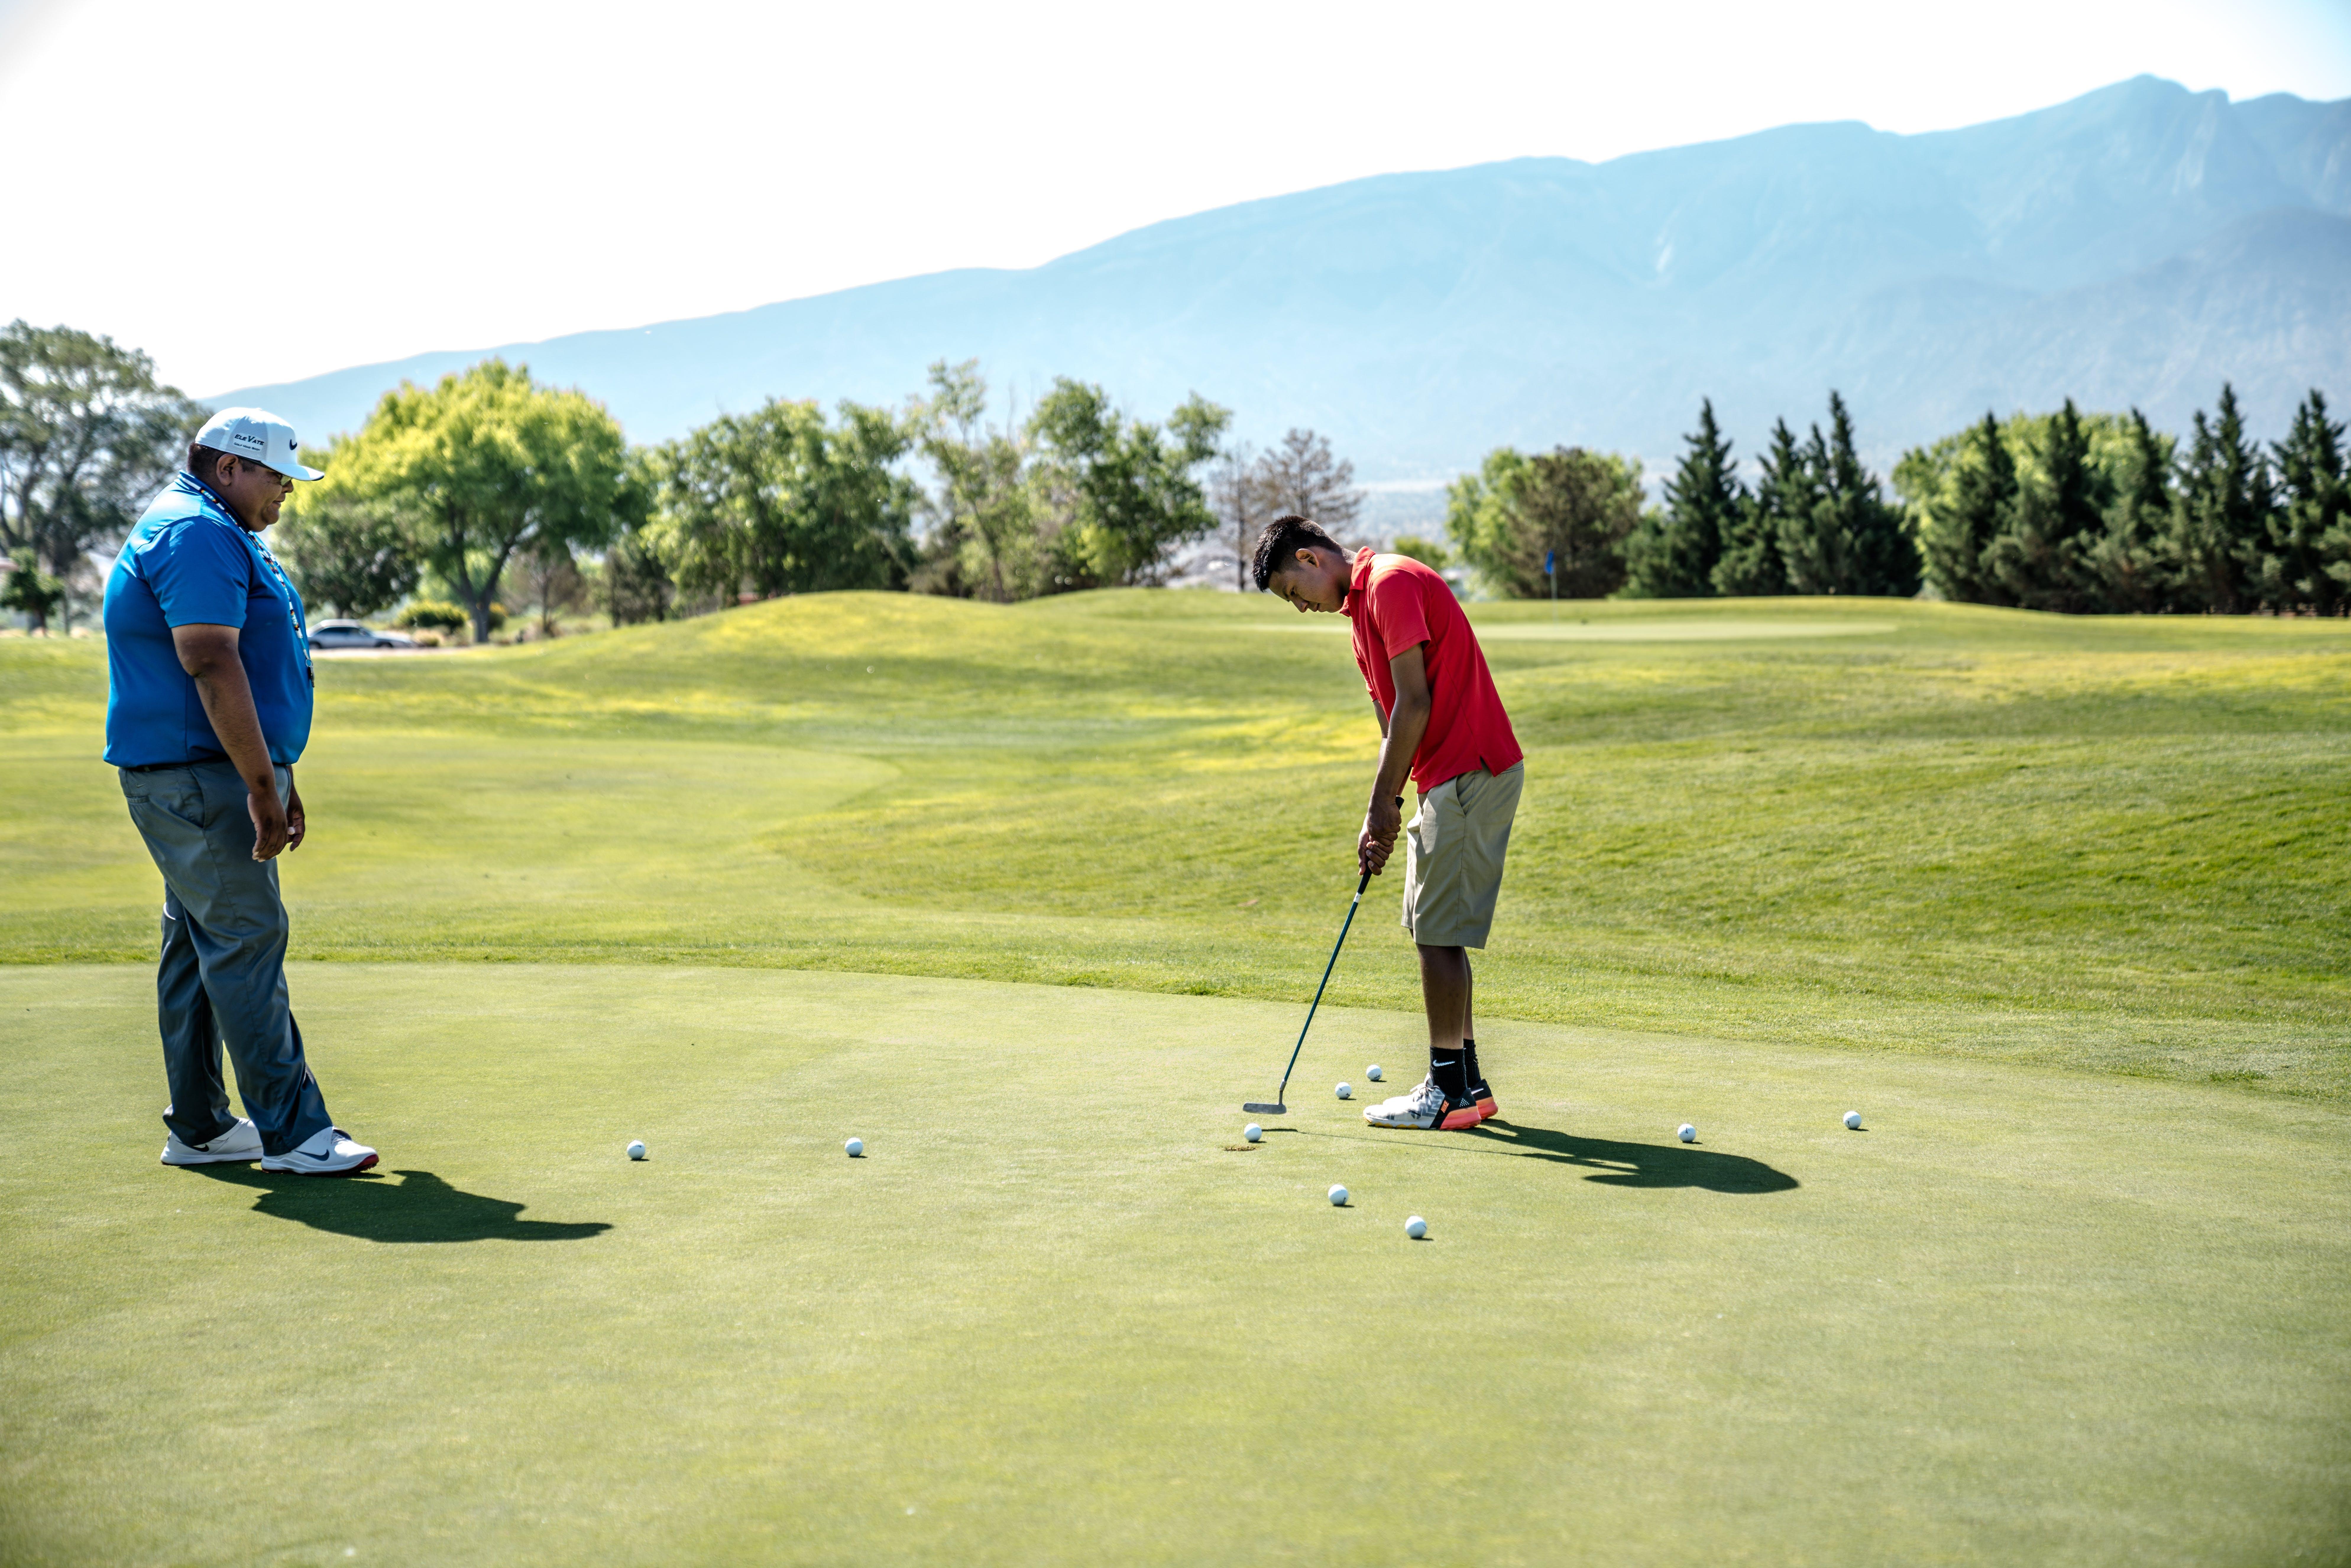 Two Men Playing Golfs